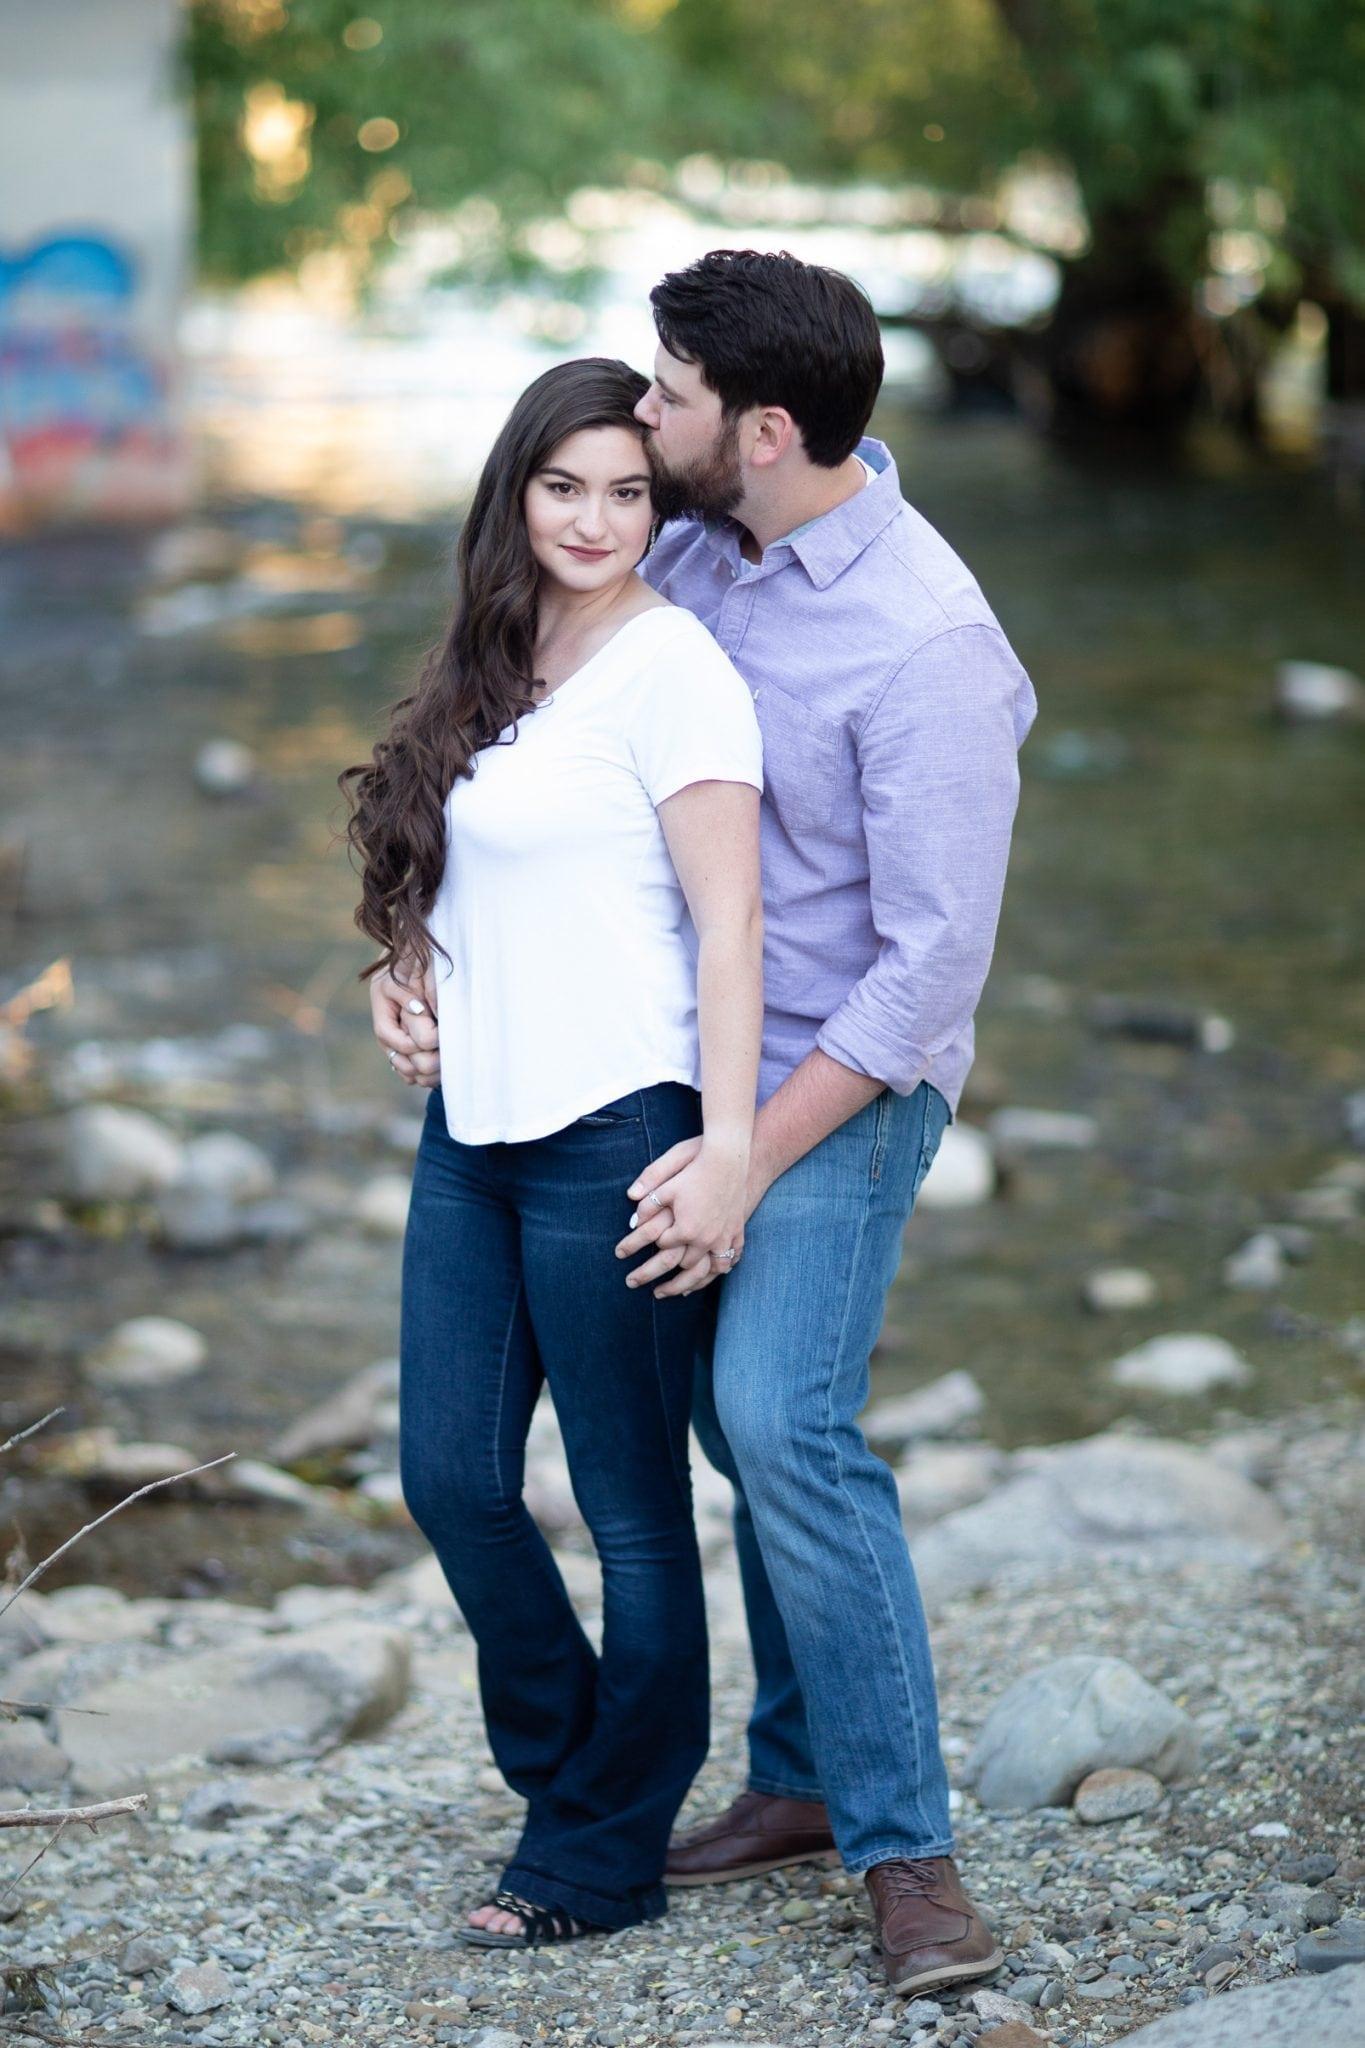 Spokane Engagement photos Franklin Photography-0005